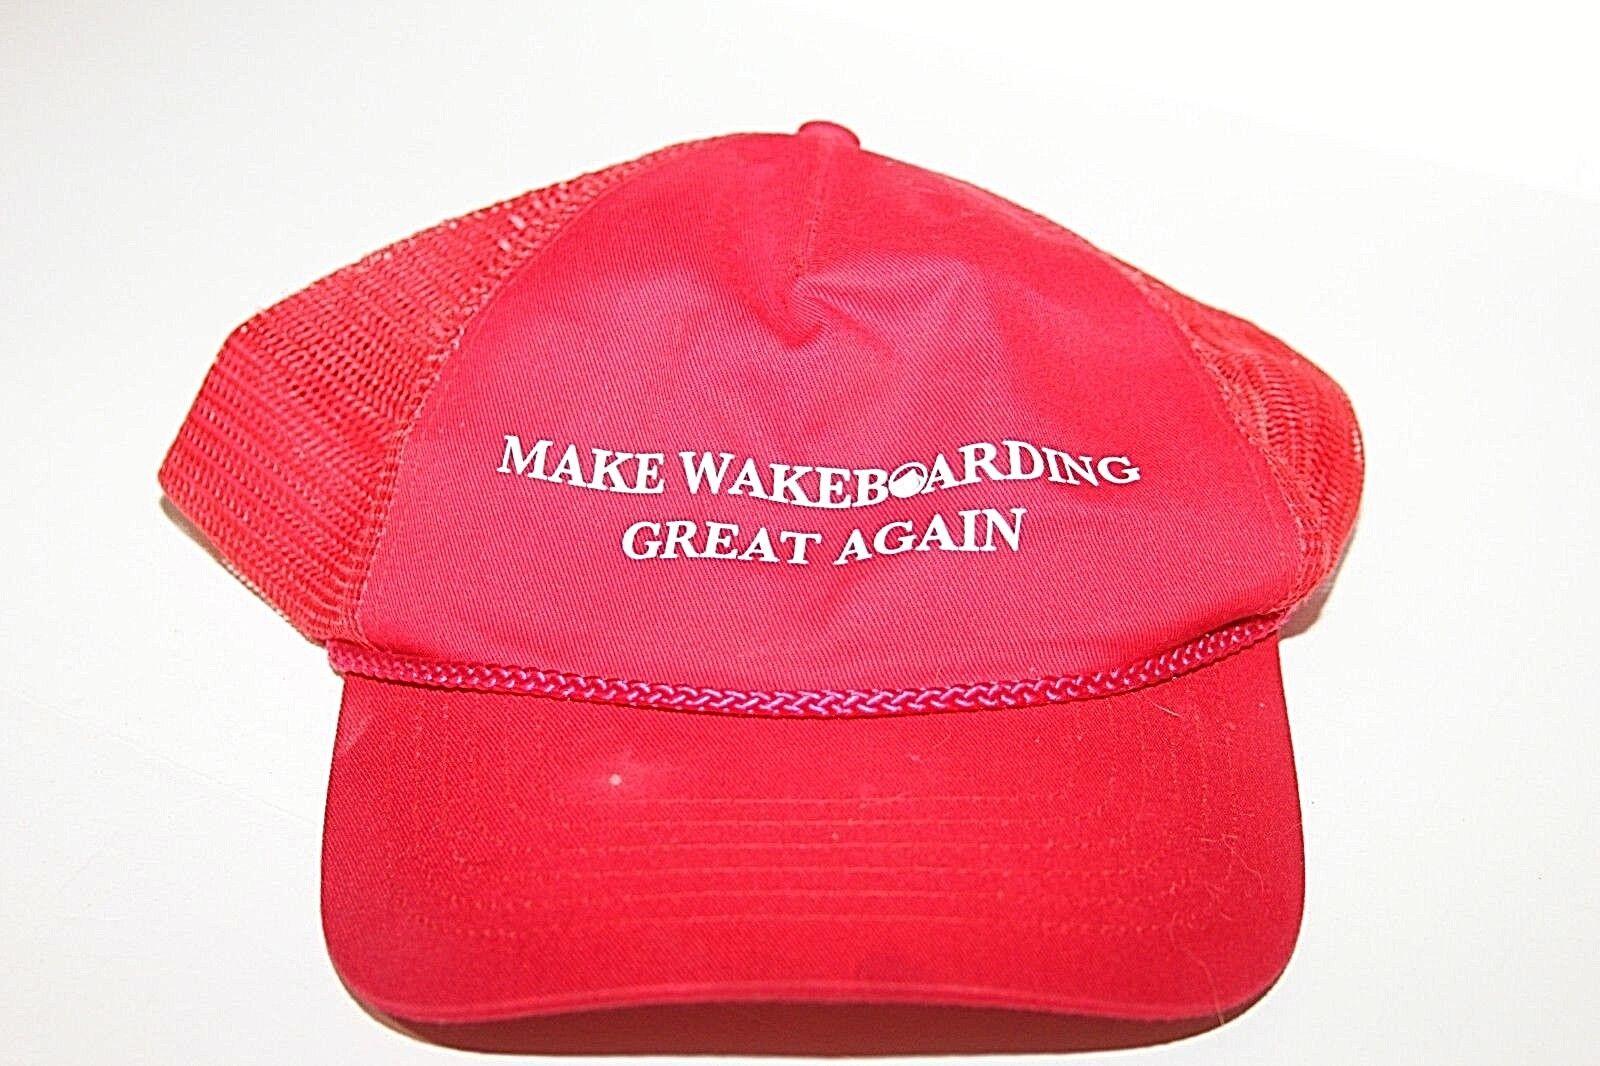 Make Wakeboarding Great Again Mesh Snapback Red Tr